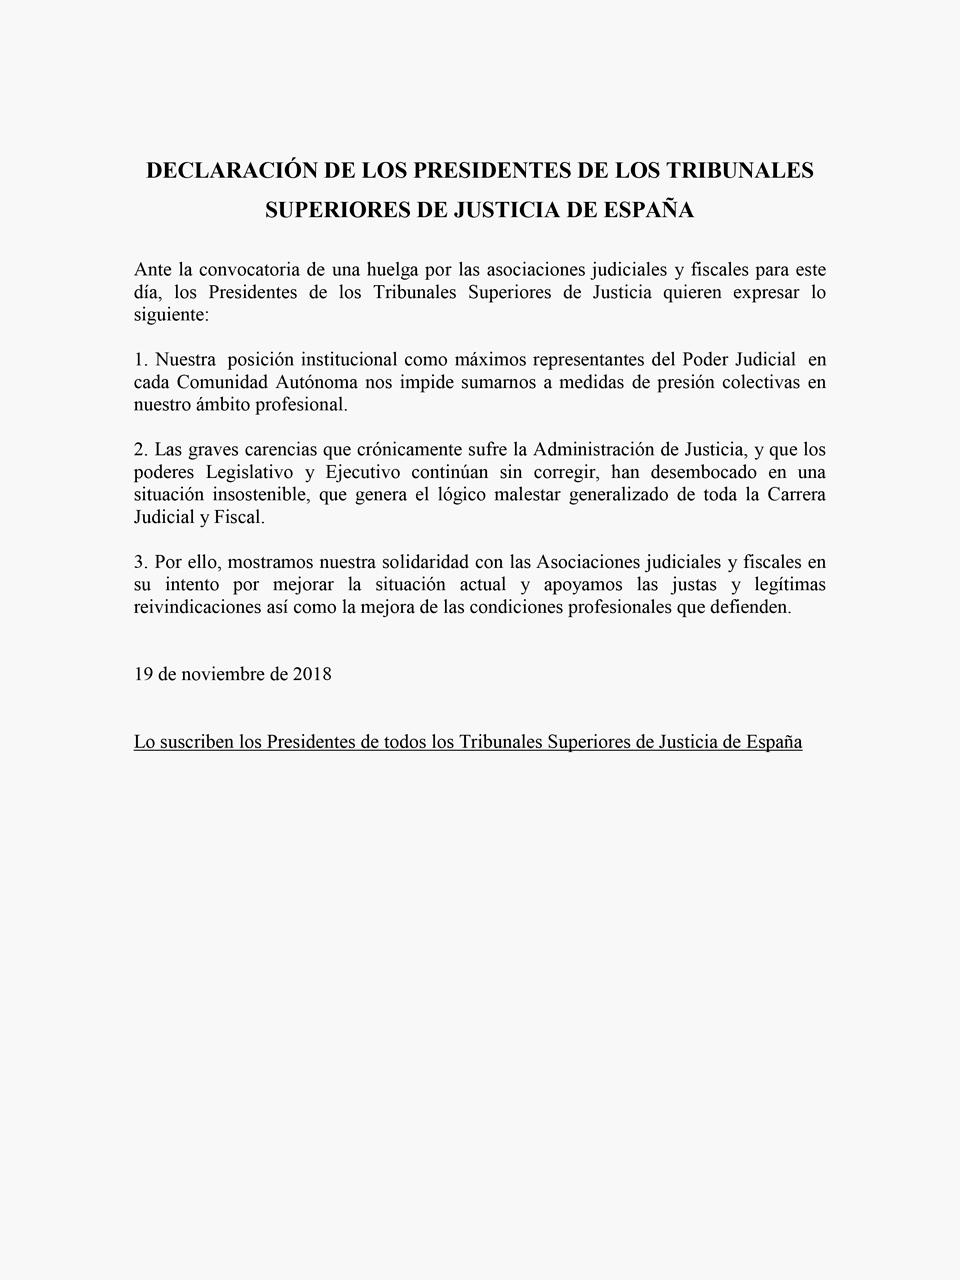 Declaraciones presidentes TSJ